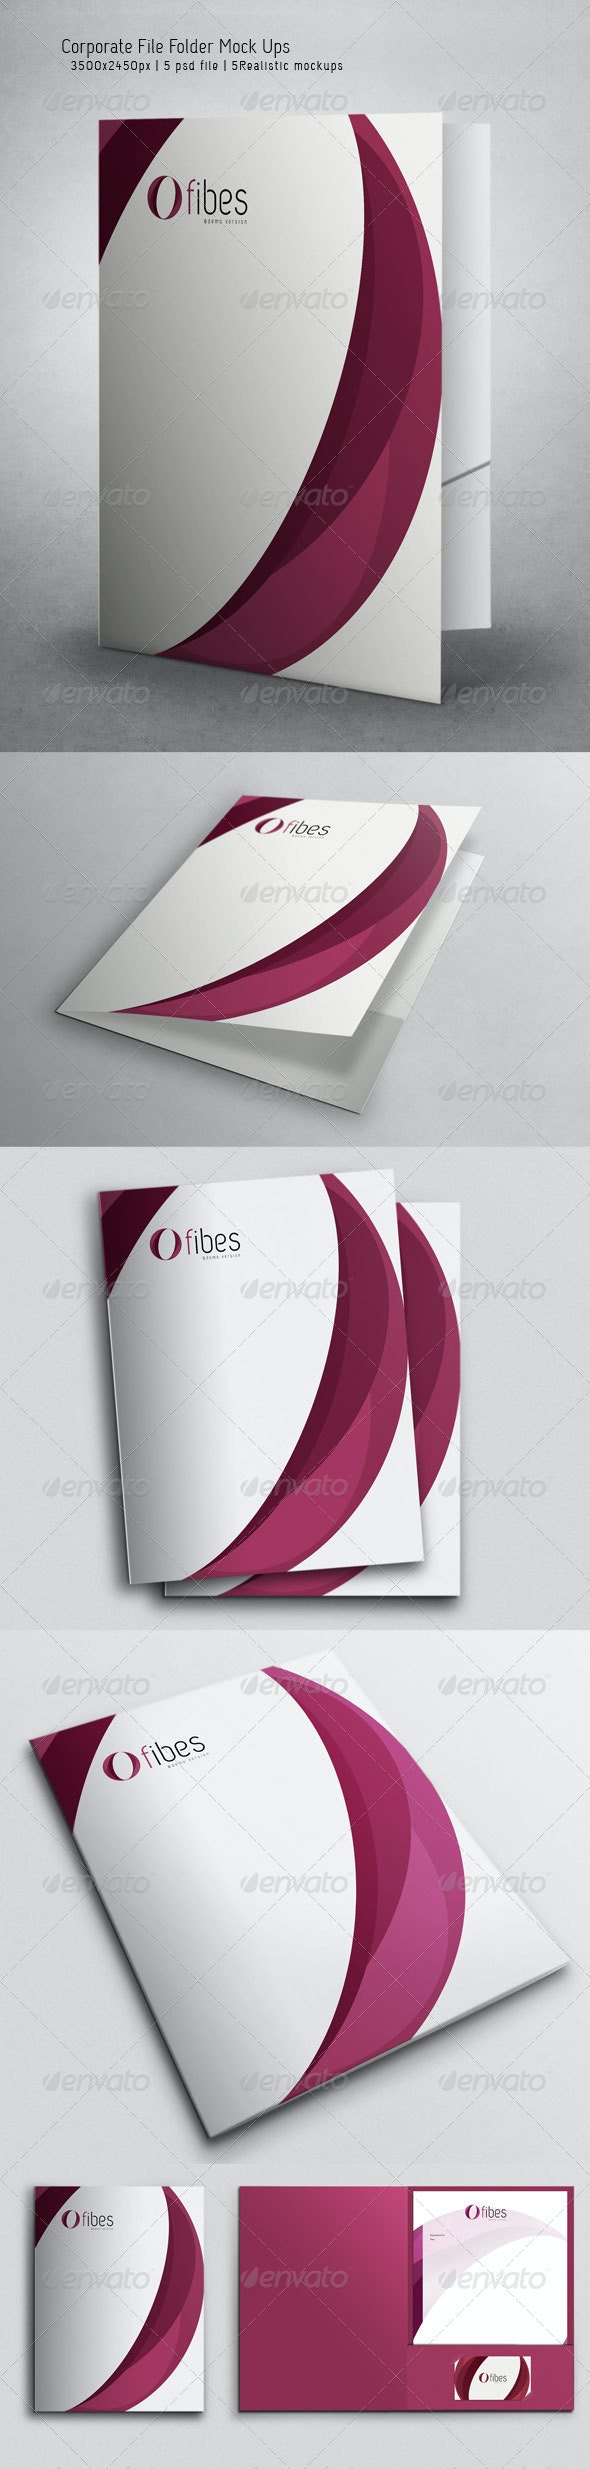 Corporate File Folder Mock Ups - Miscellaneous Print